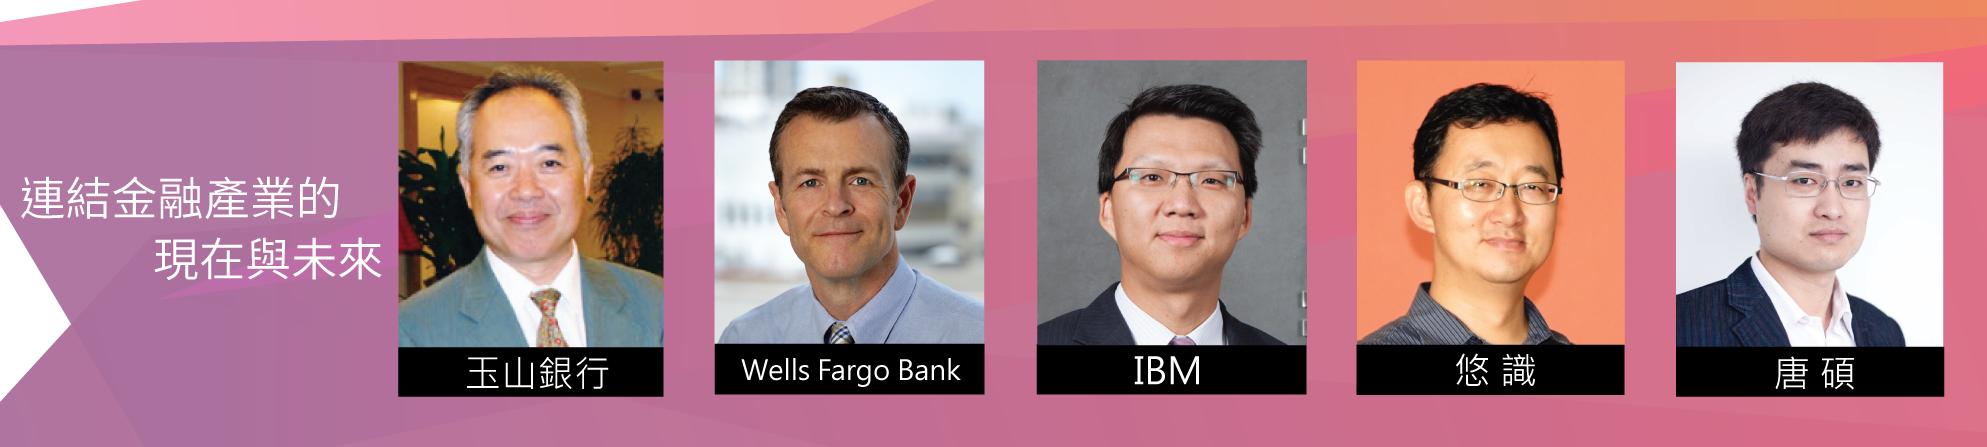 FutureBank 未來金融創新體驗設計論壇